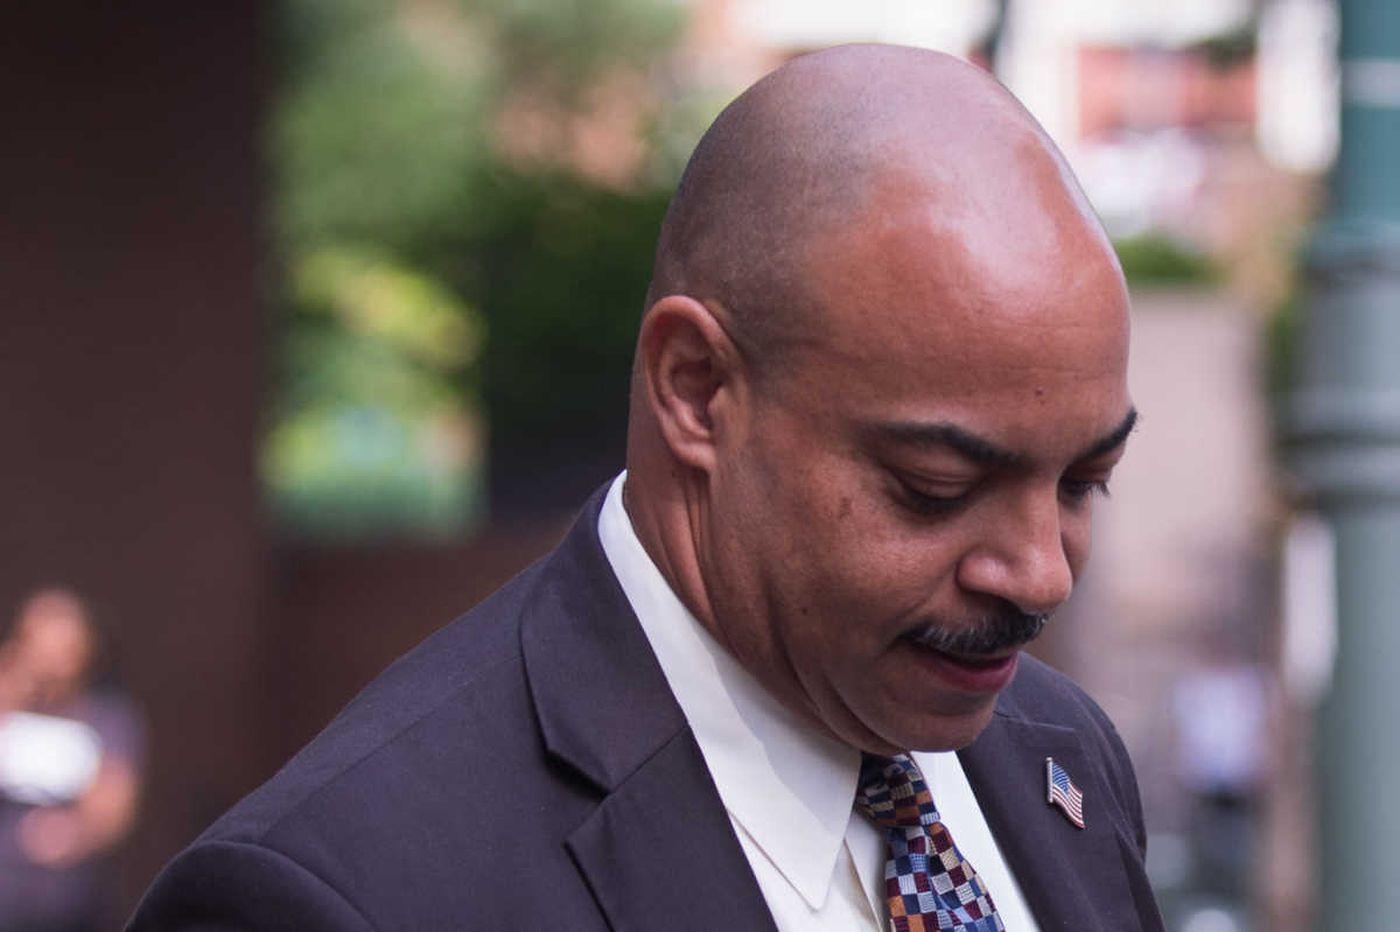 Williams' corruption tarnishes all blacks | Readers respond